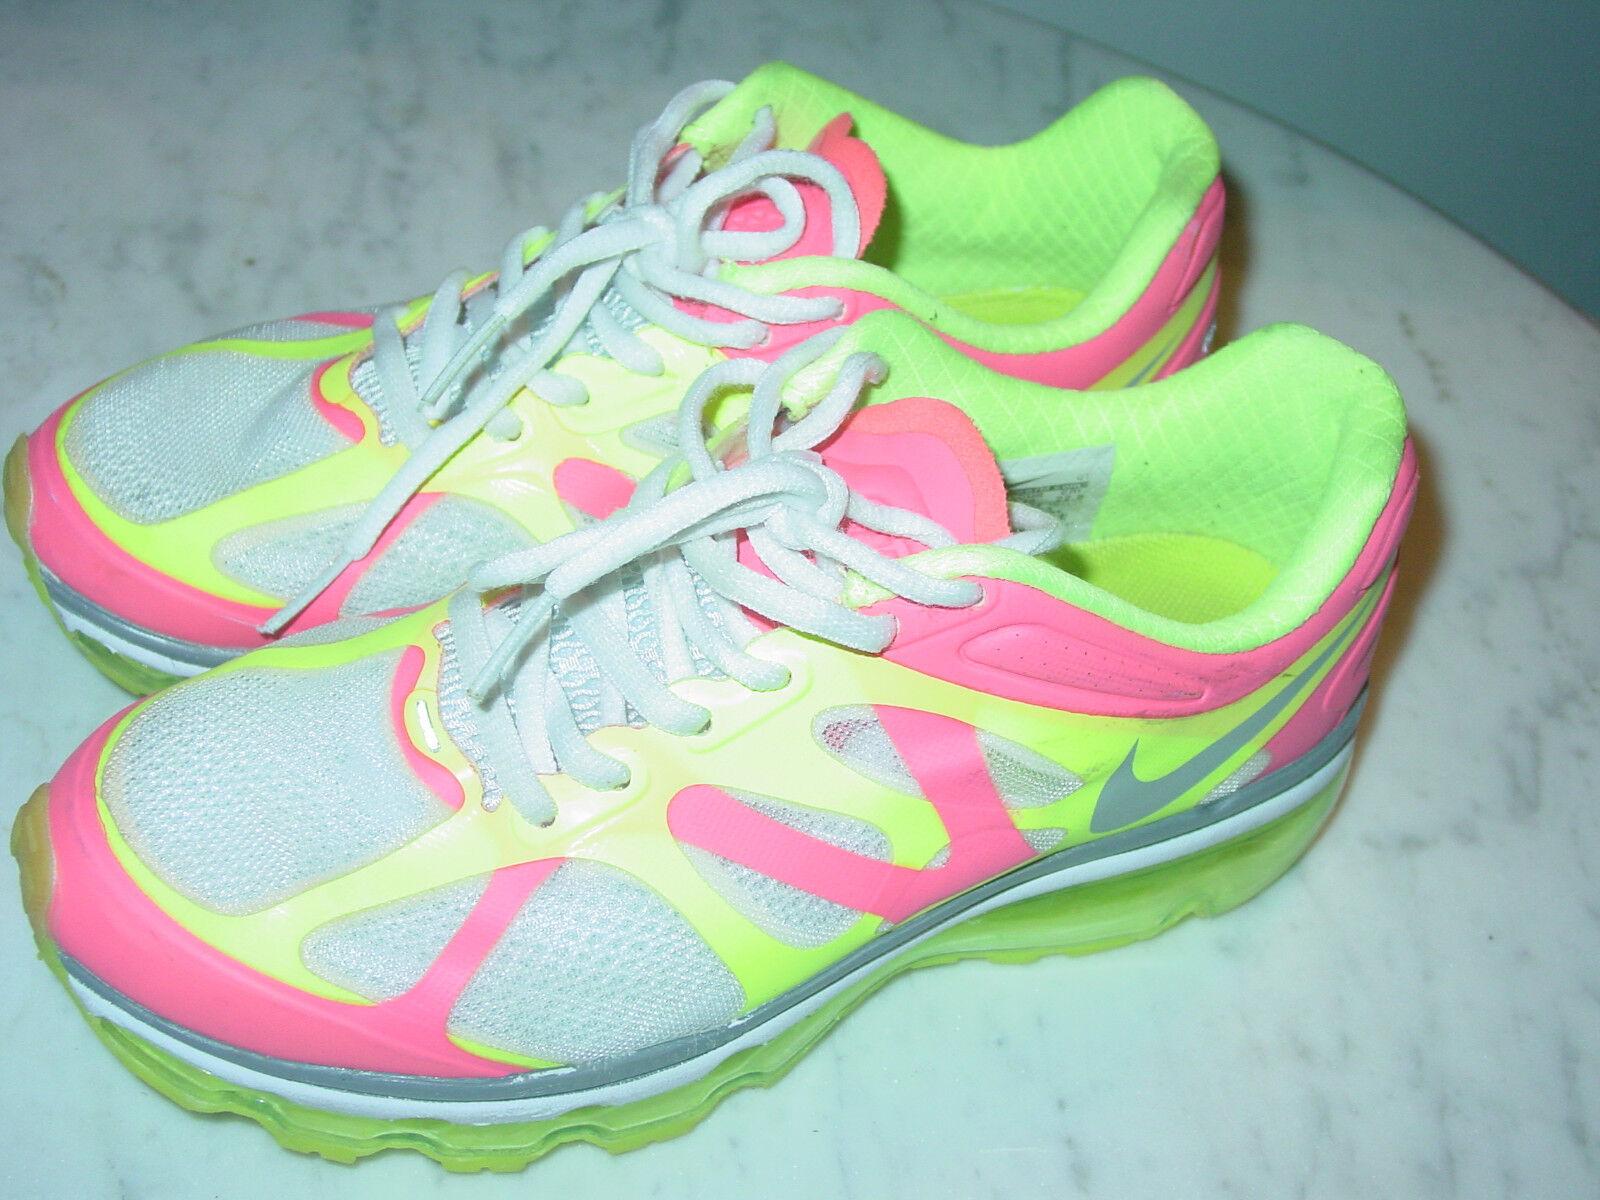 2011 Nike Air Max+ 2012 2012 2012 White Metallic Platinum Running shoes  Size 5.5  160.00 52a389